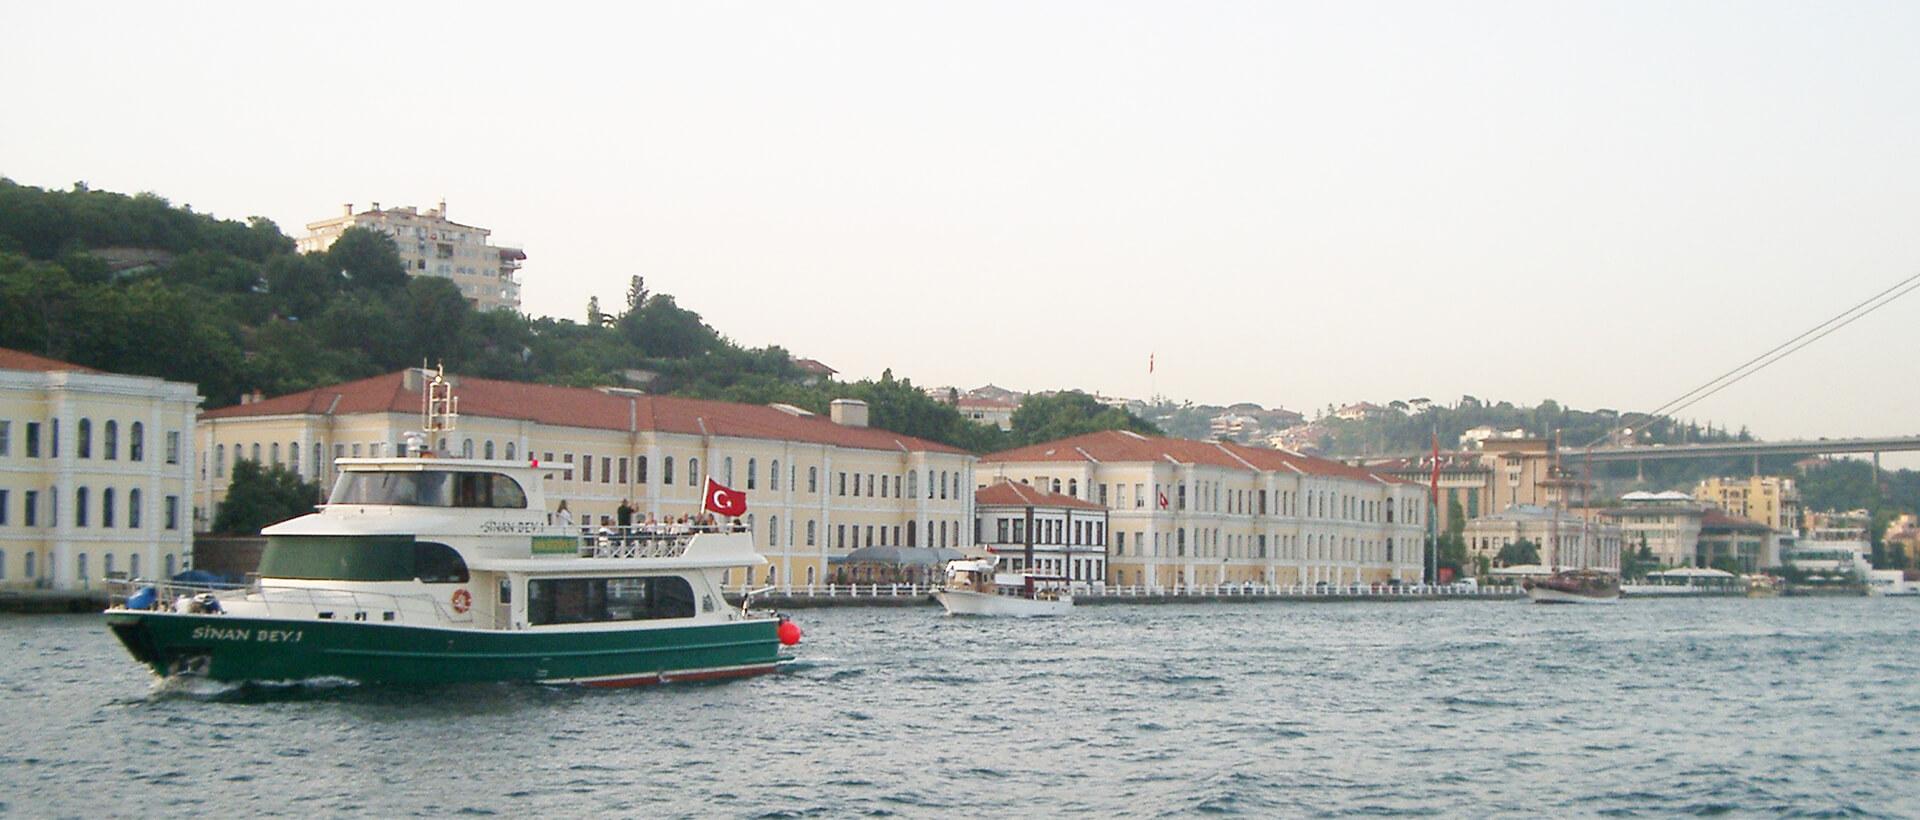 High School on the Bosphorus